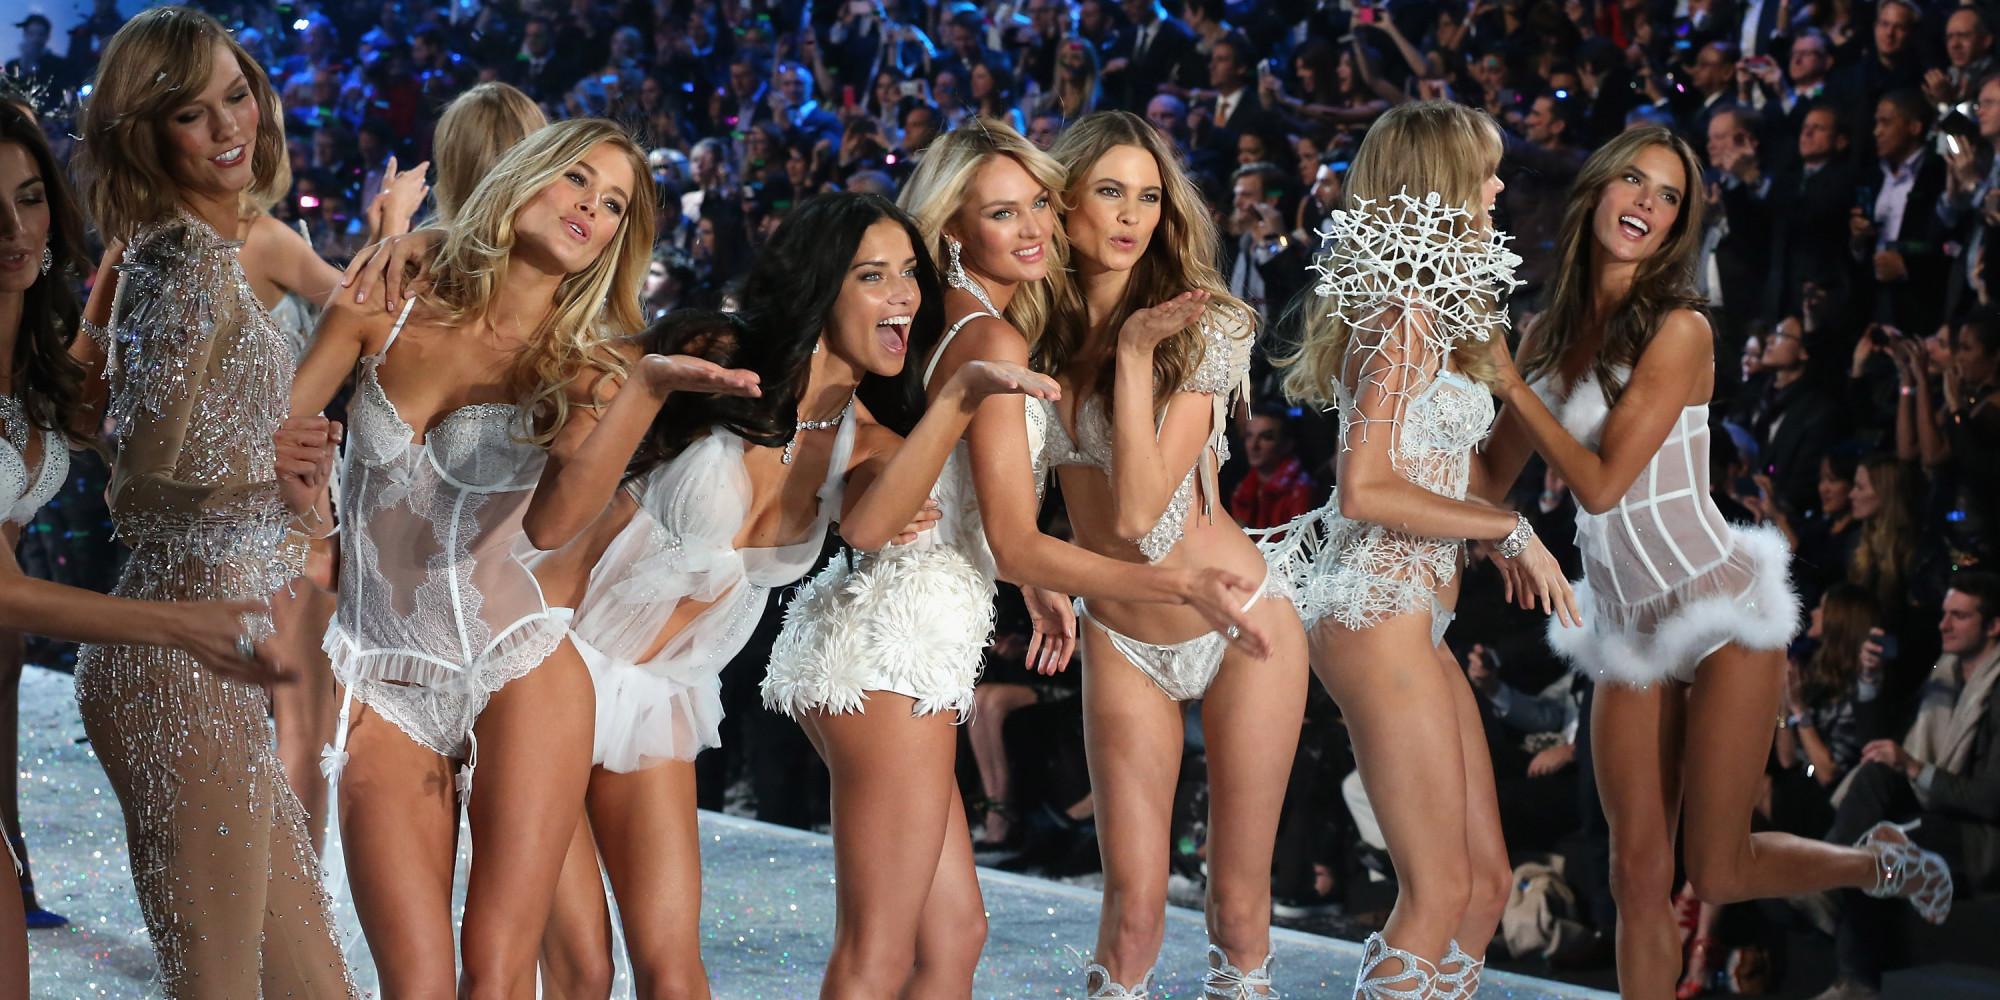 American girl fashion show modesto